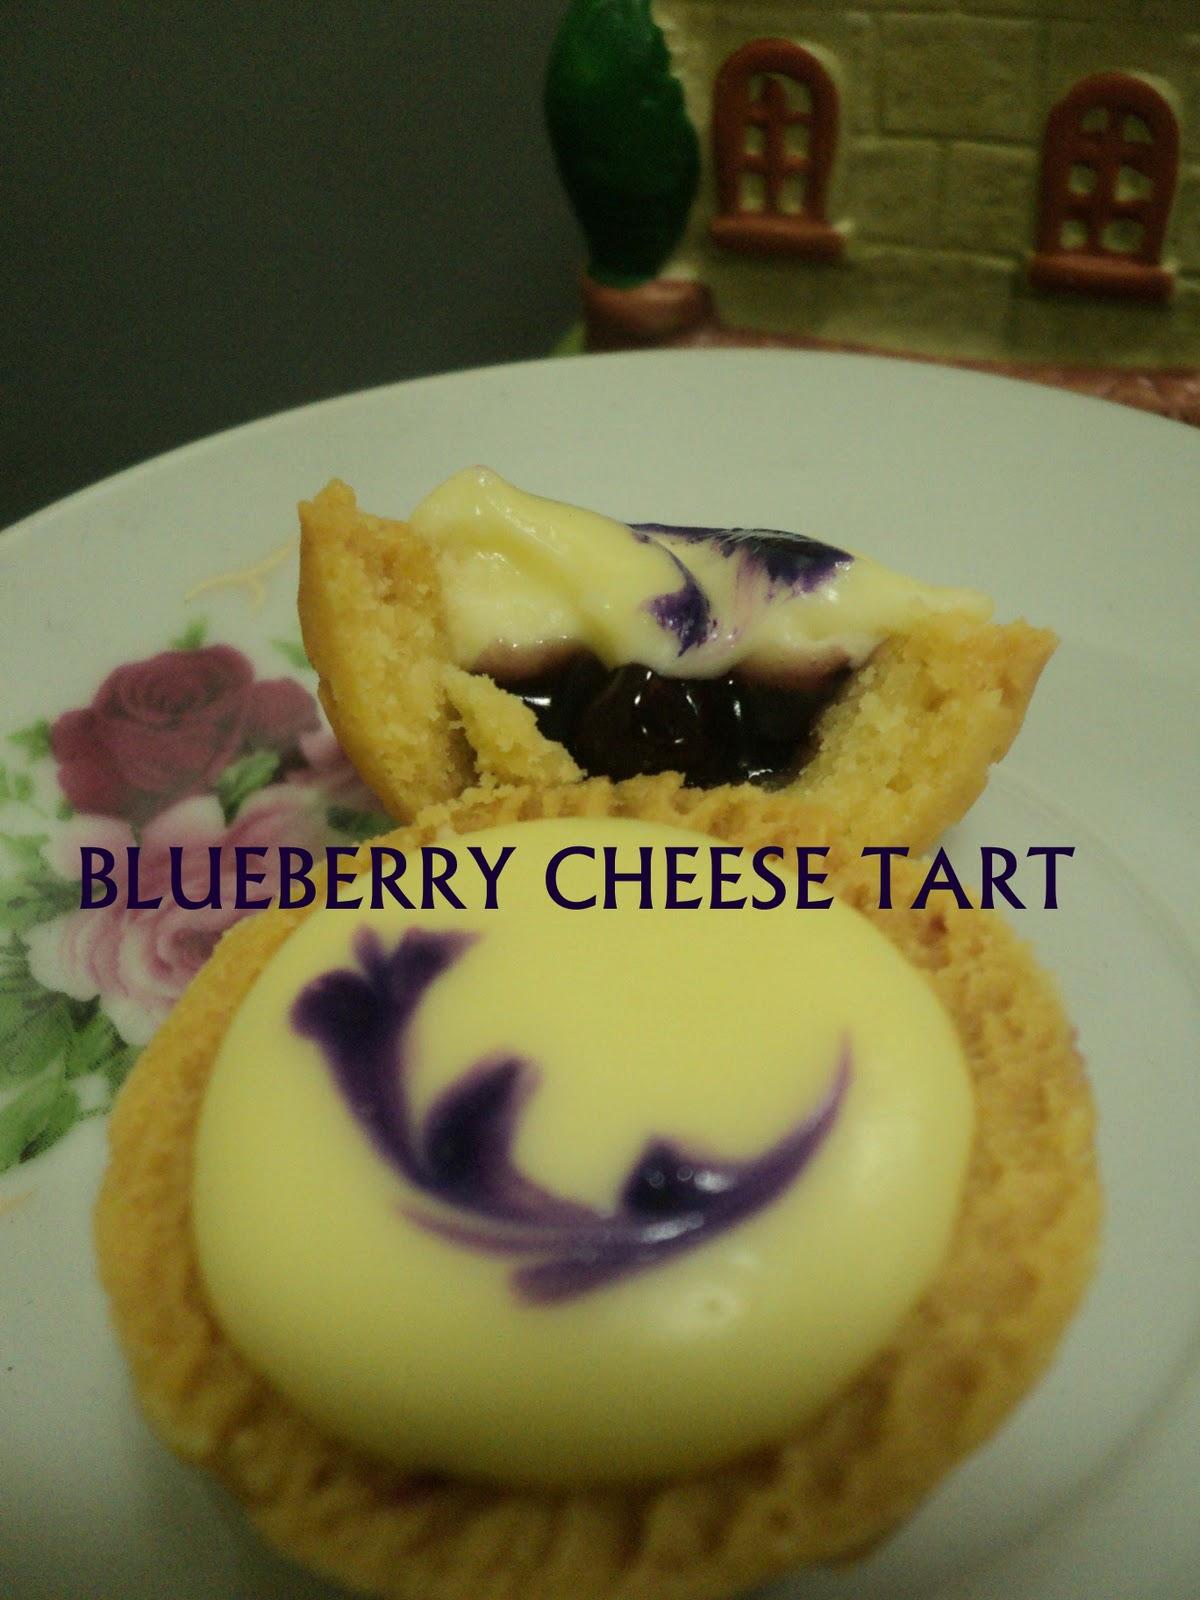 Jangan Biarkan Cream Cheese Mencapai Ke Suhu Bilik Isi Adunan Dalam Piping Bag Untuk Memudahkan Proses Mengisi Crust